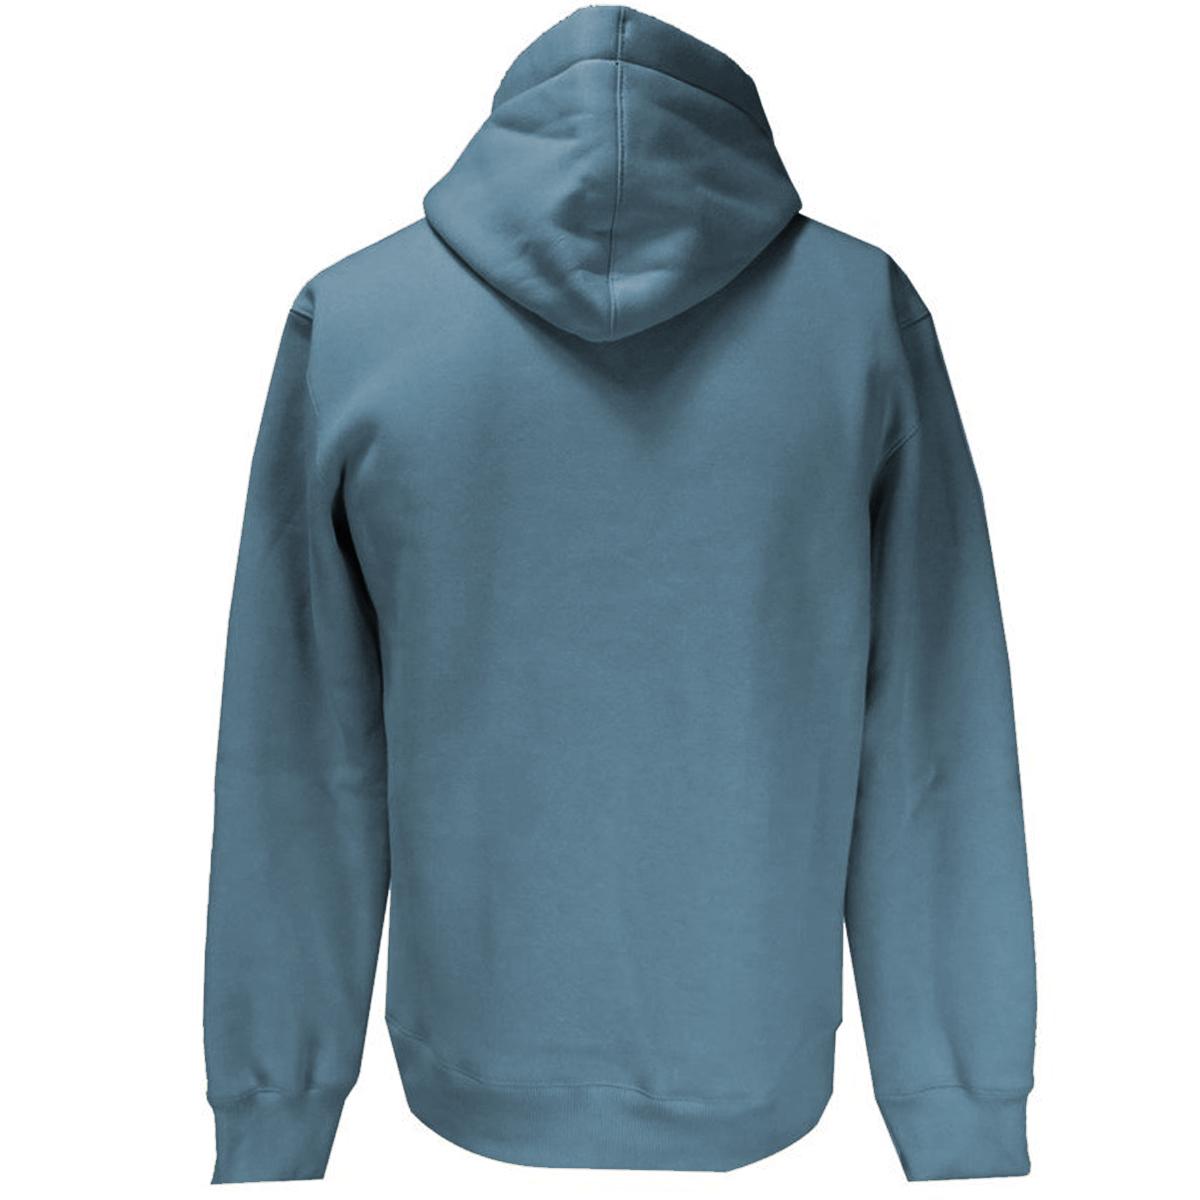 Moletom Oakley One Brand Pullover Cinza ref 472363-64X 89eb91d1a5